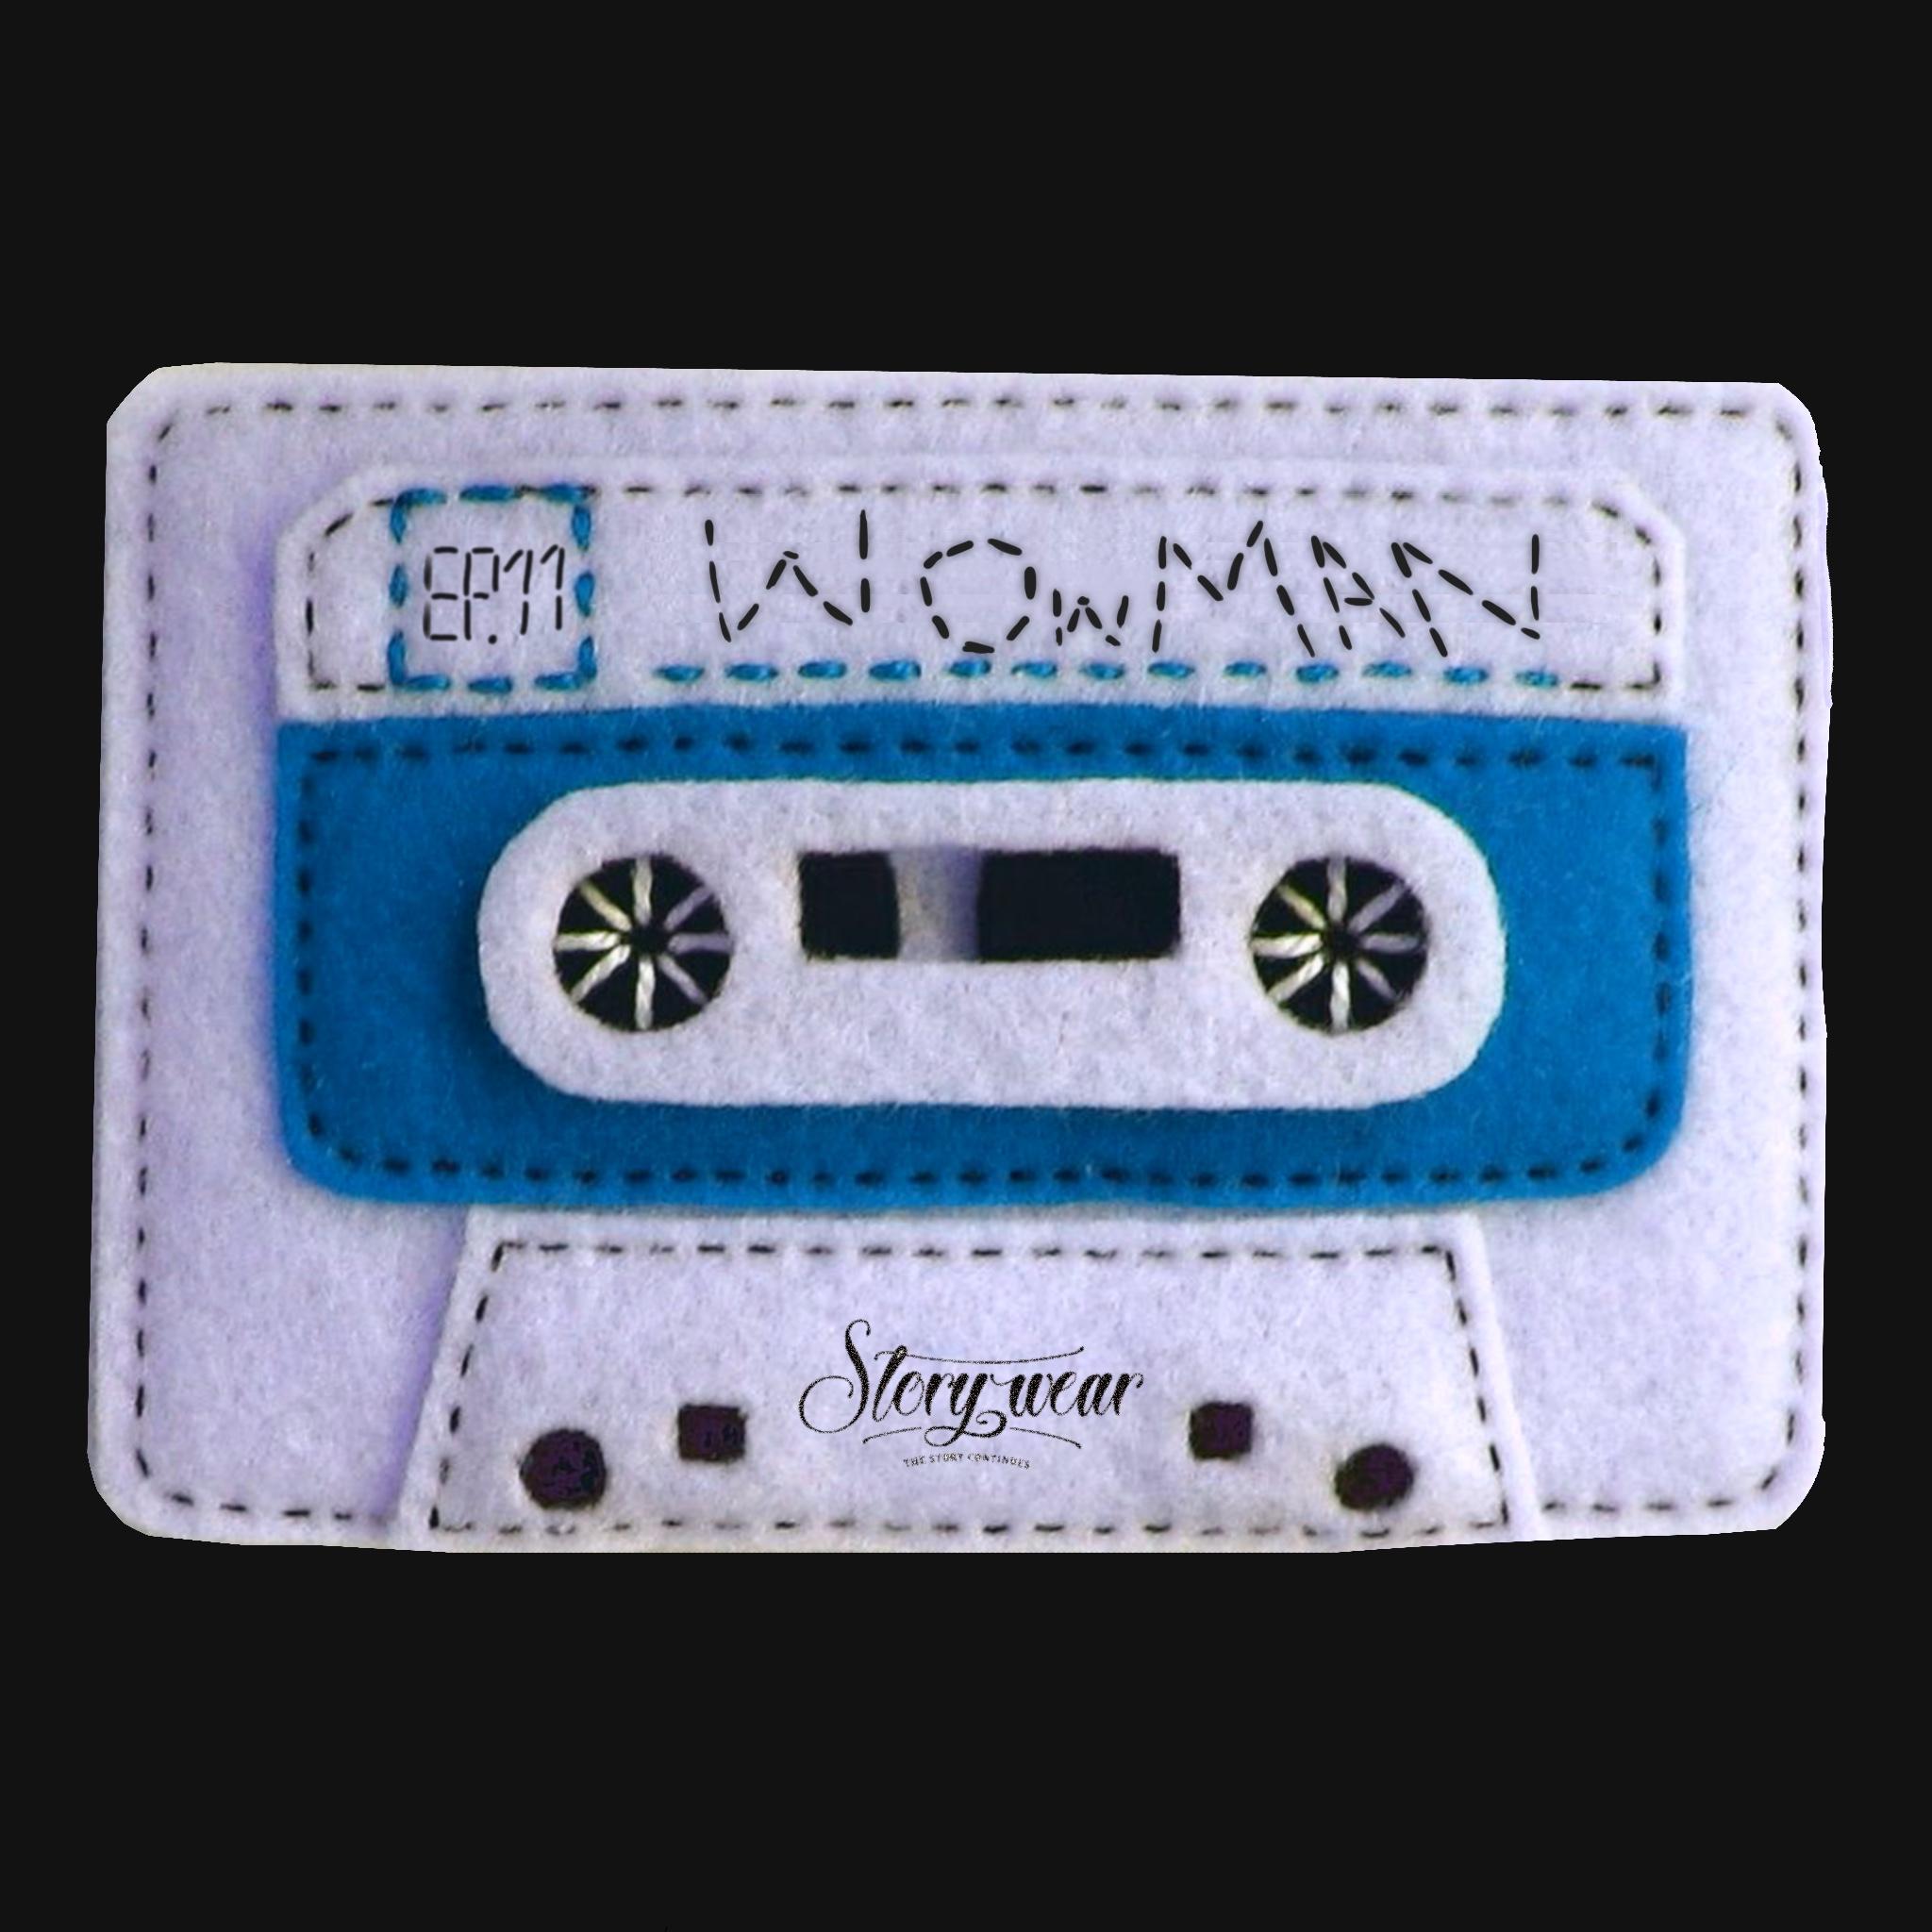 [EP11] 女力爆發,從八零鄉村到高年級實習生 WOwMAN